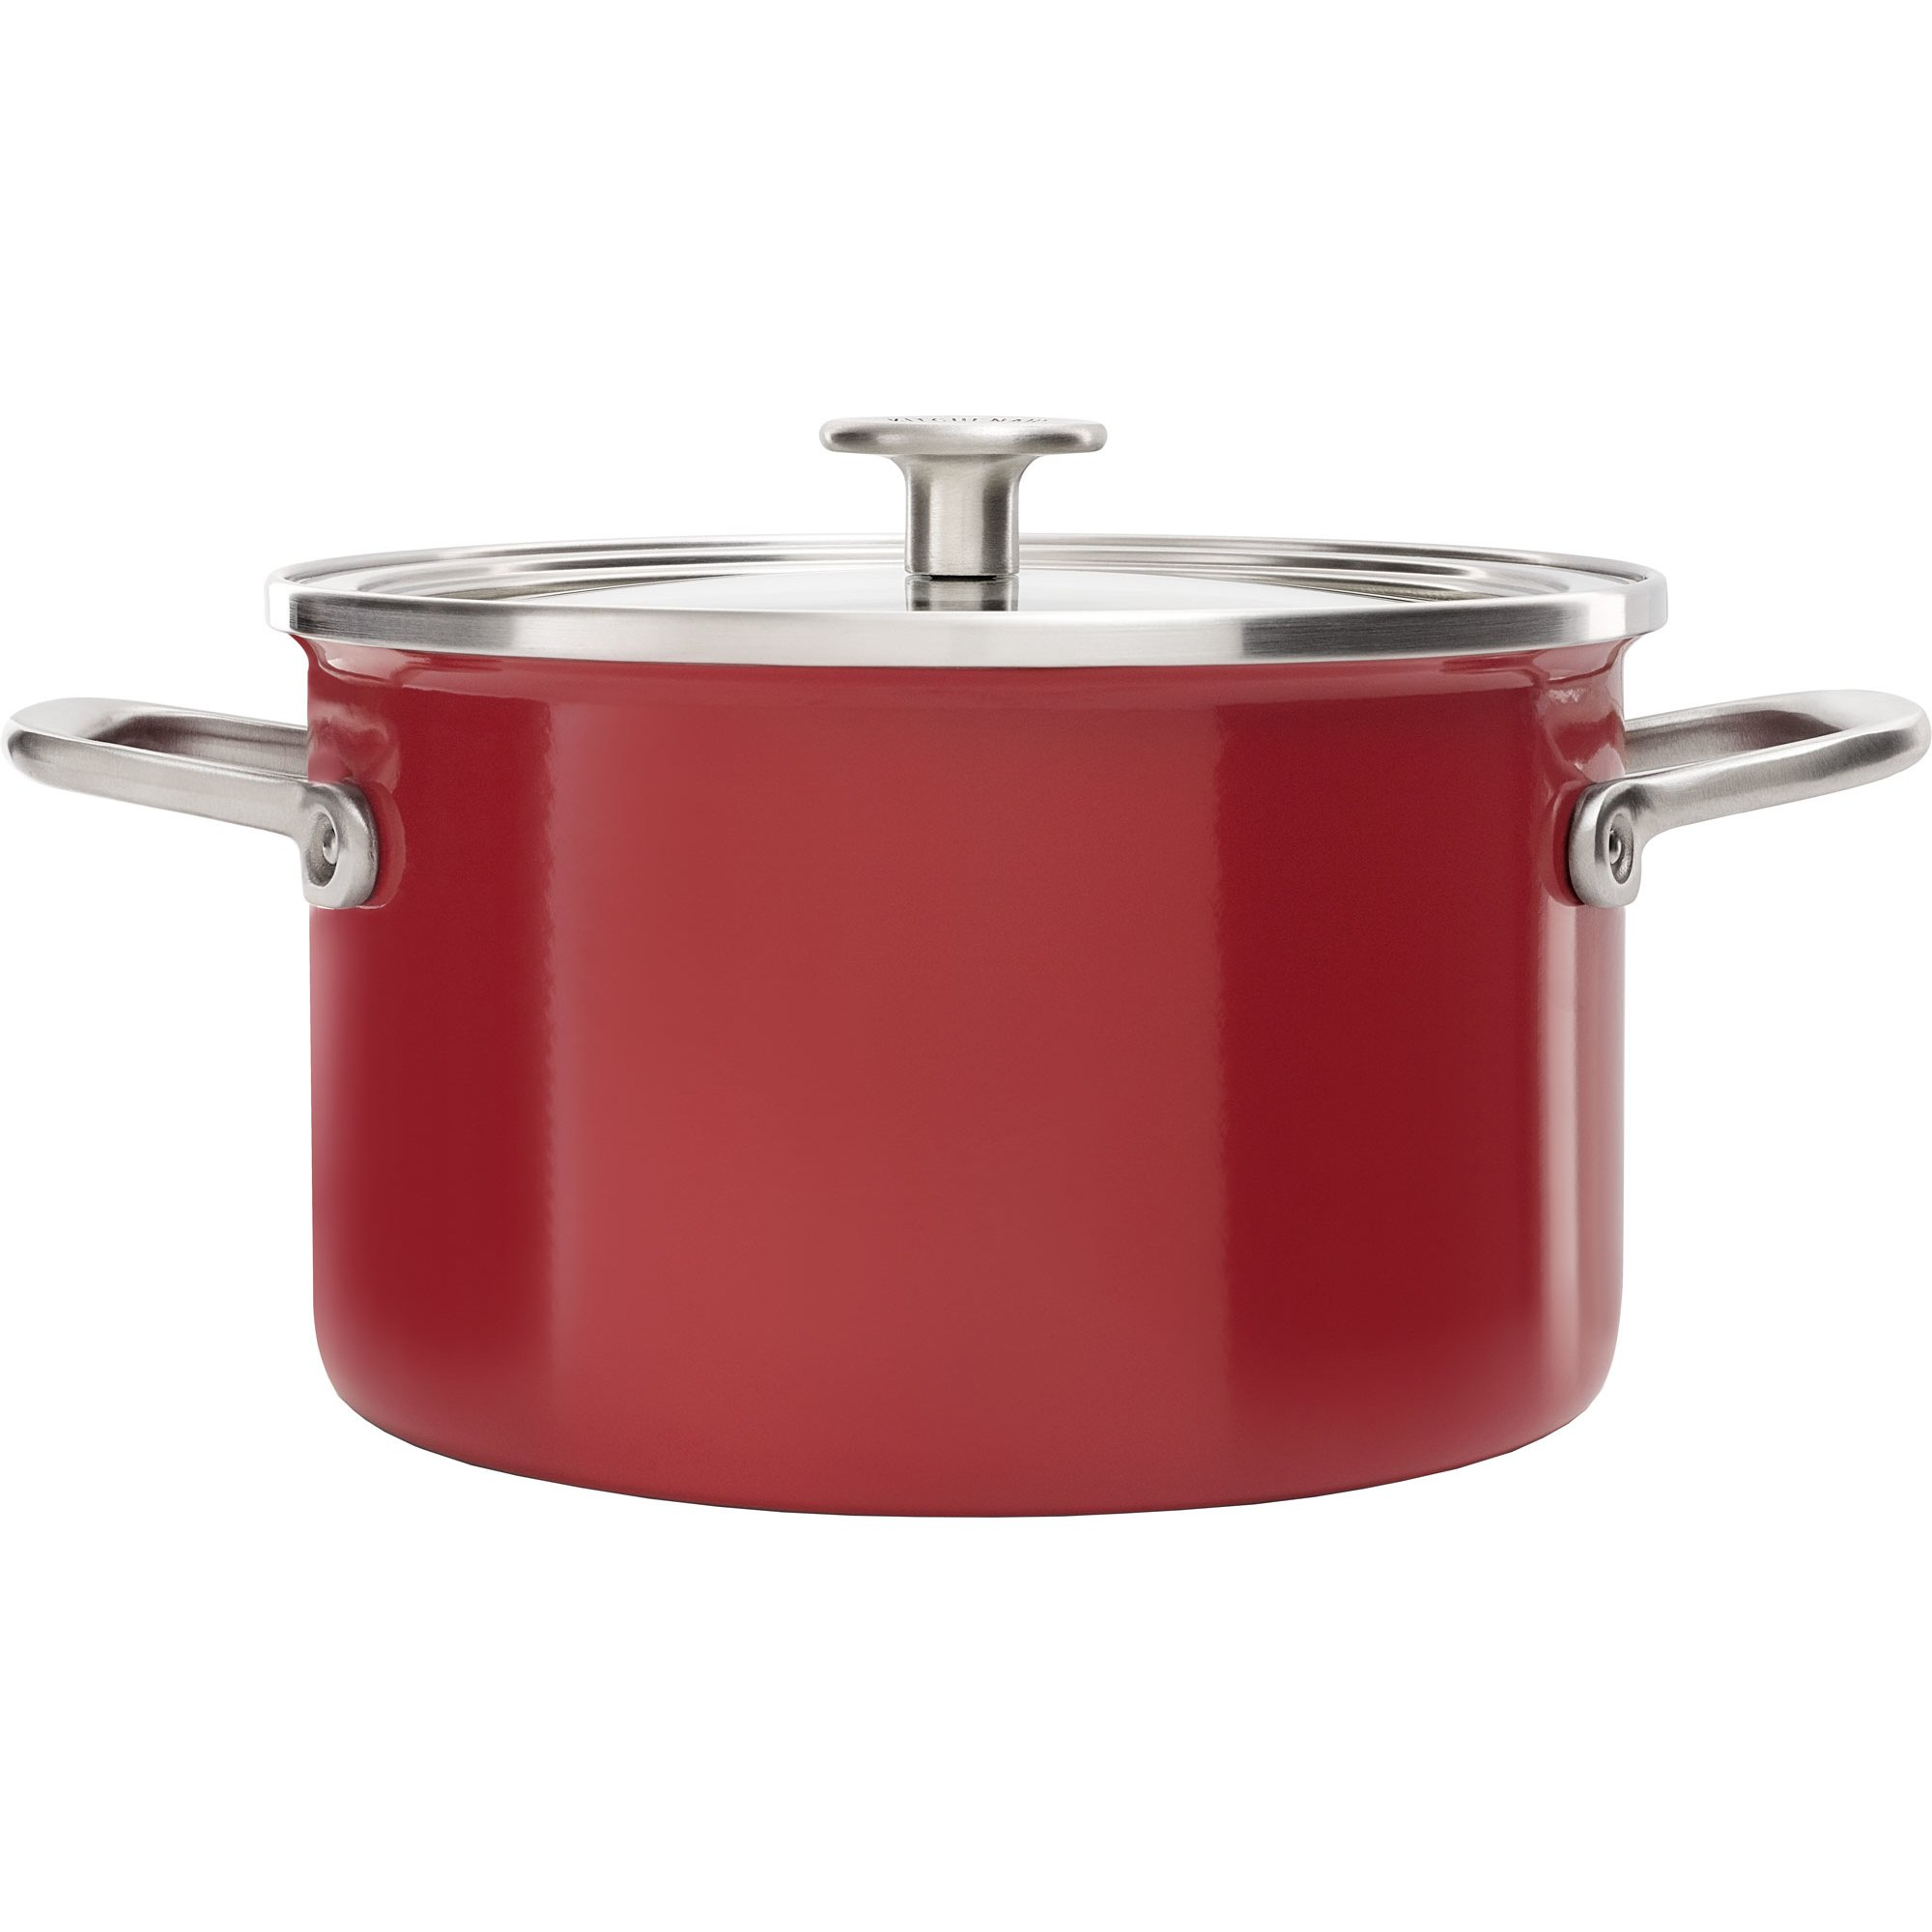 KitchenAid Cookware Collection Gryta m/lock 20 cm röd